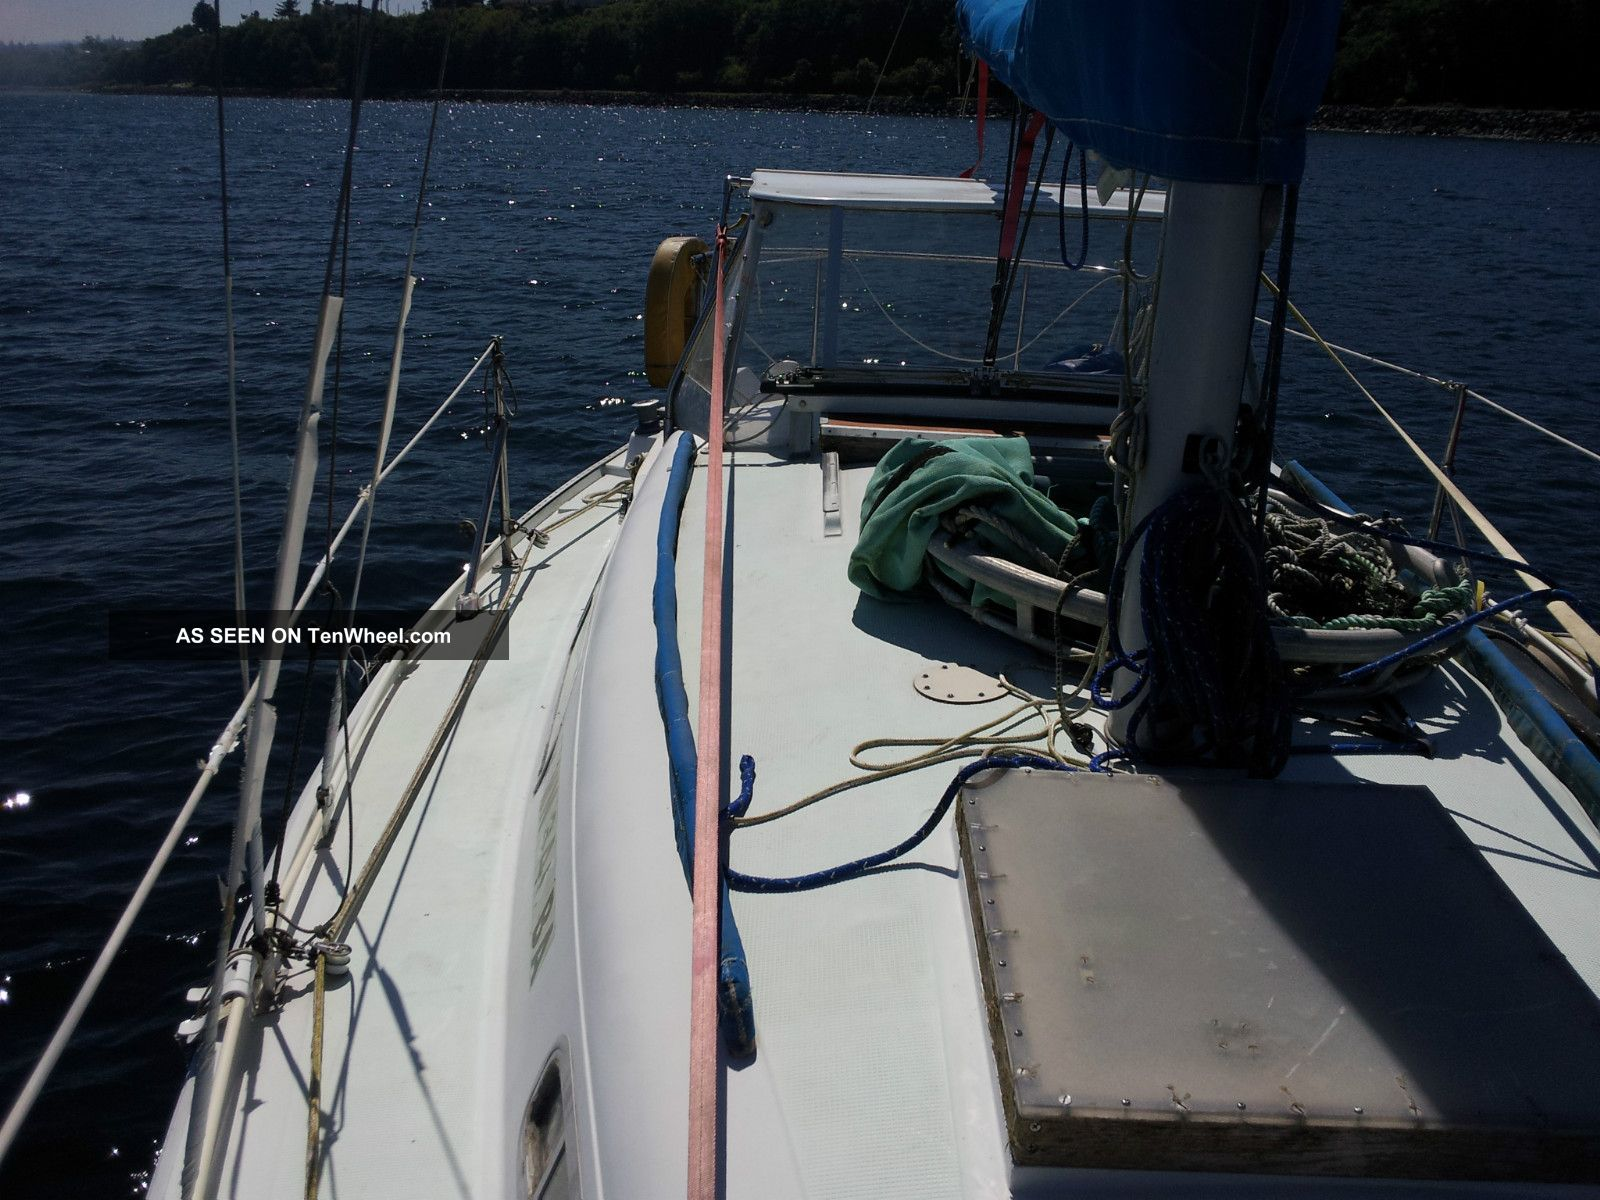 1976 Ericson 27 ' Mk 1 Sailboats 20-27 feet photo